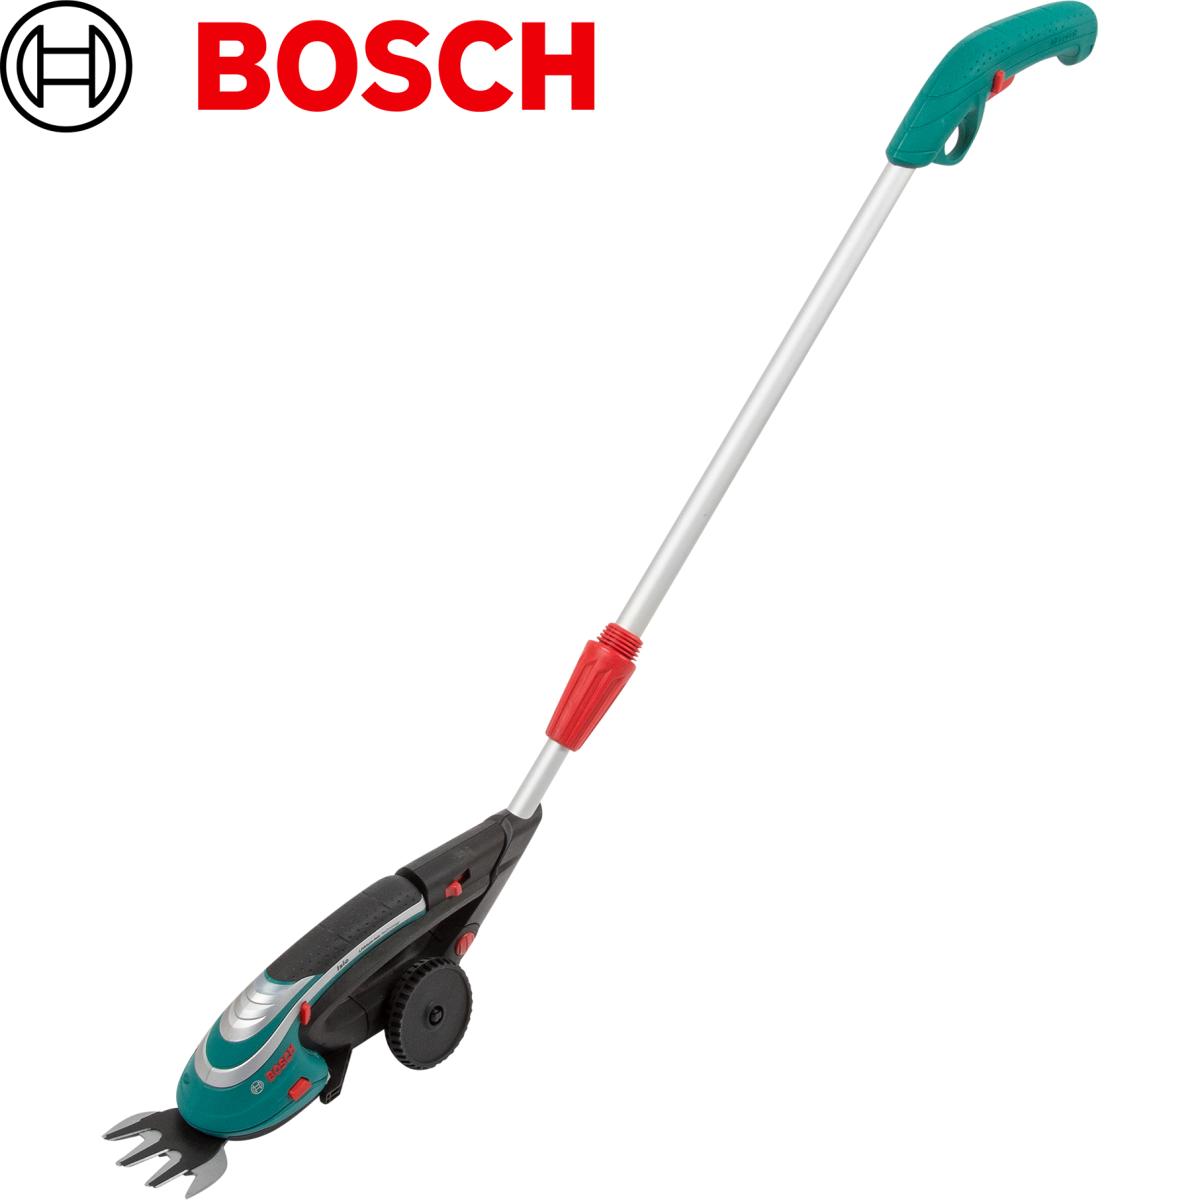 Ножницы аккумуляторные Bosch Isio со штангой